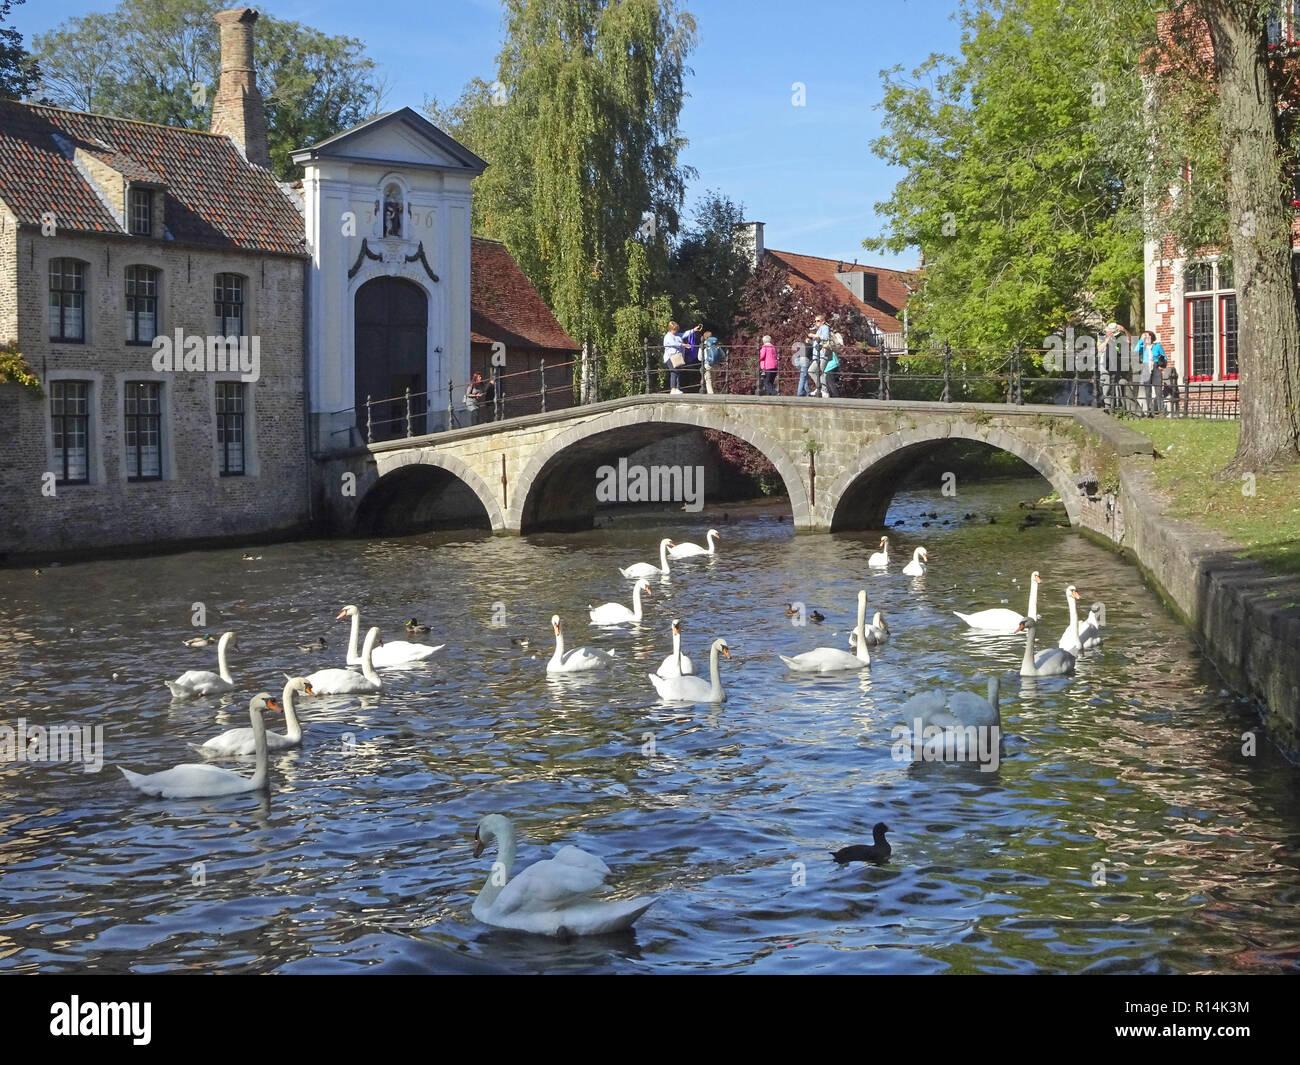 Swans near a stone arch bridge in Brudges Belgium. - Stock Image